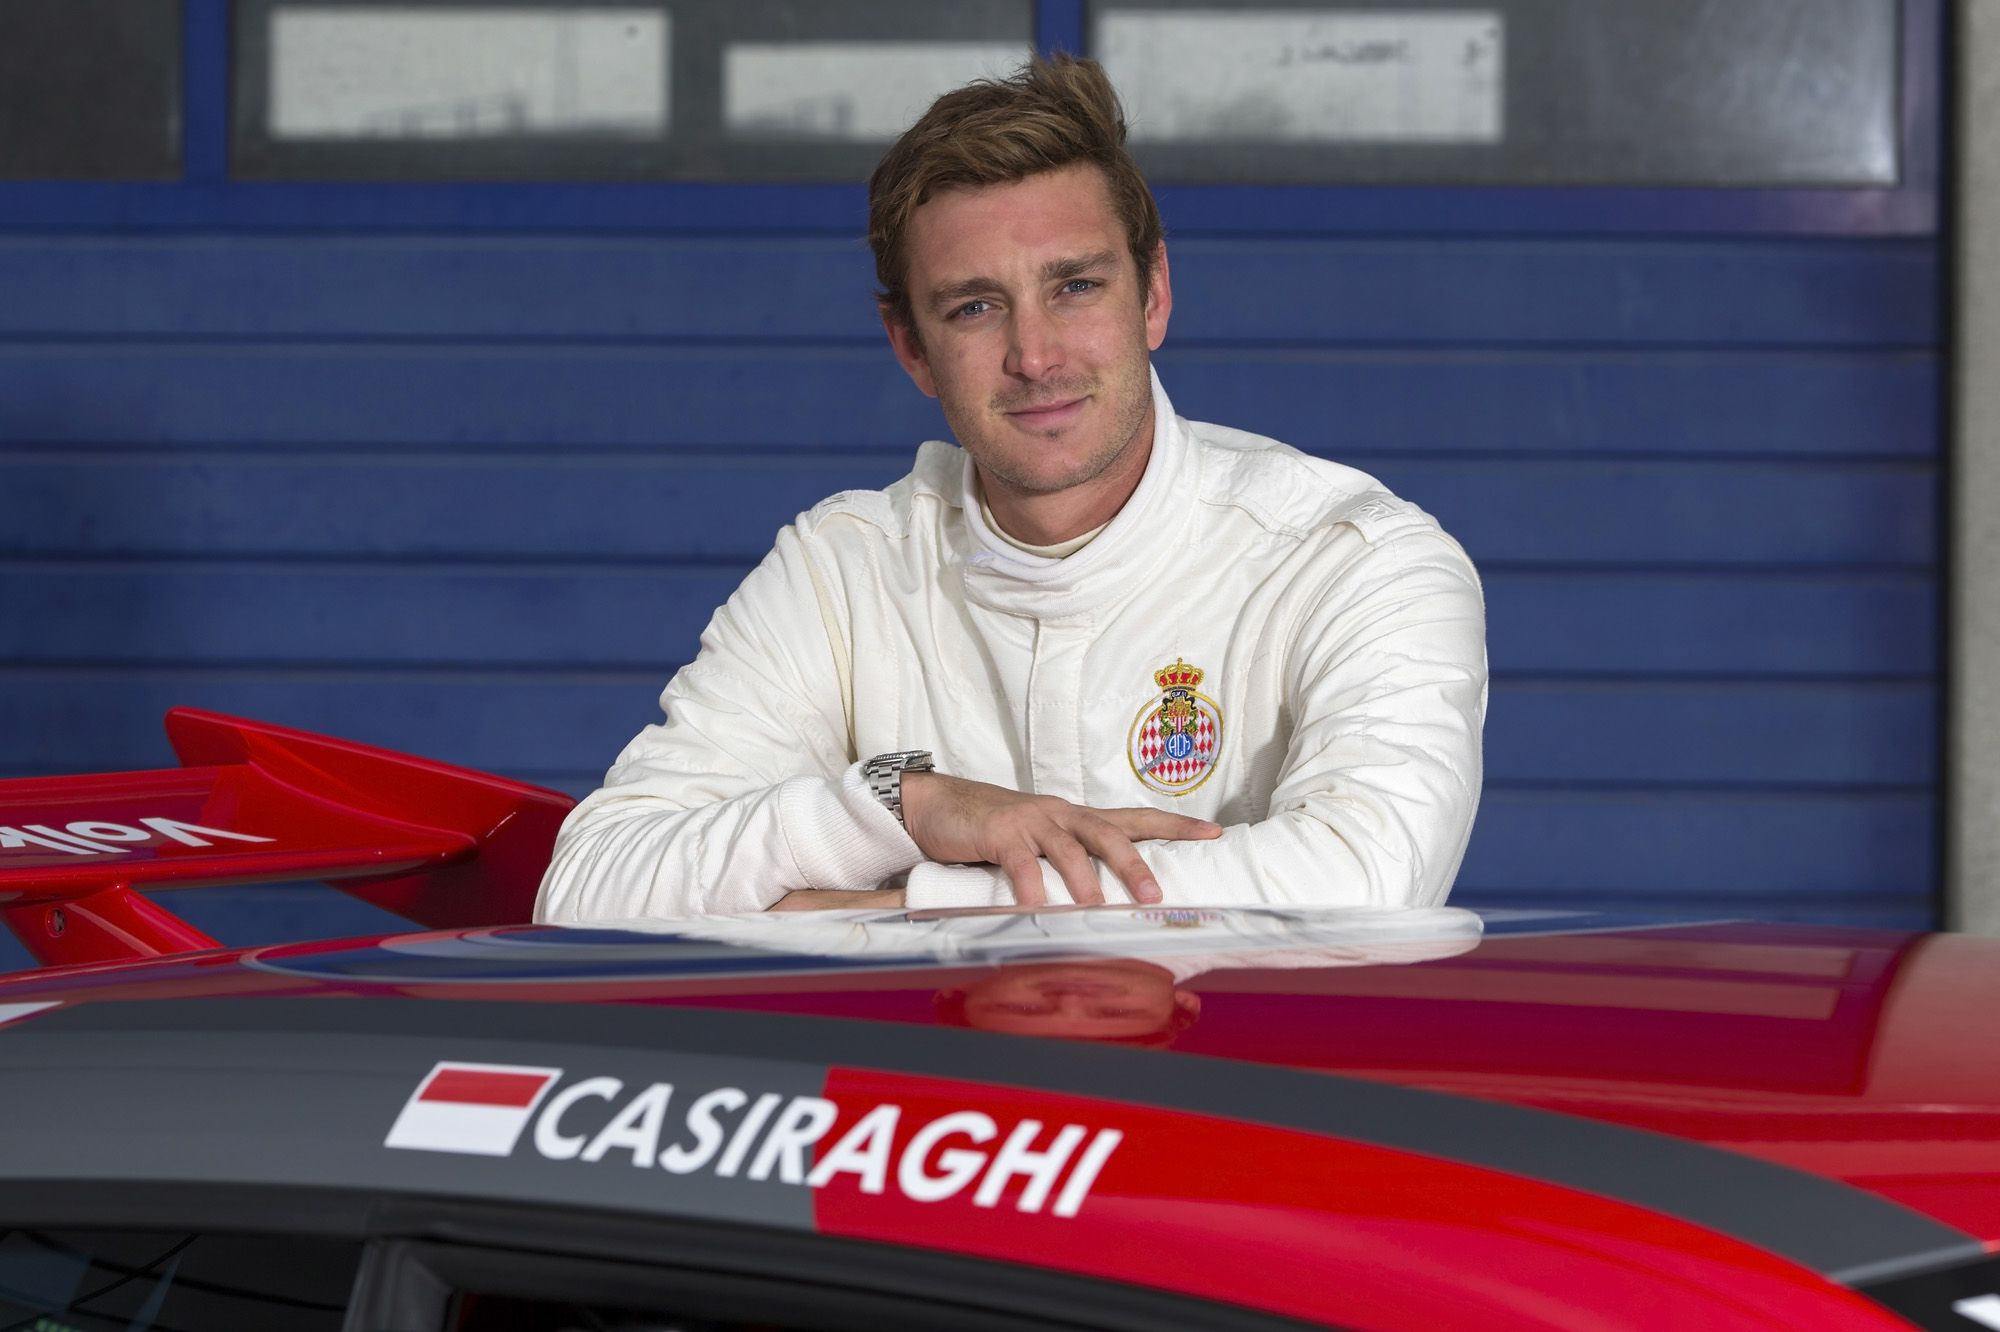 Pierre Rainier Stefano Casiraghi 2014   Pierre-Casiraghi-profession-pilote.jpg